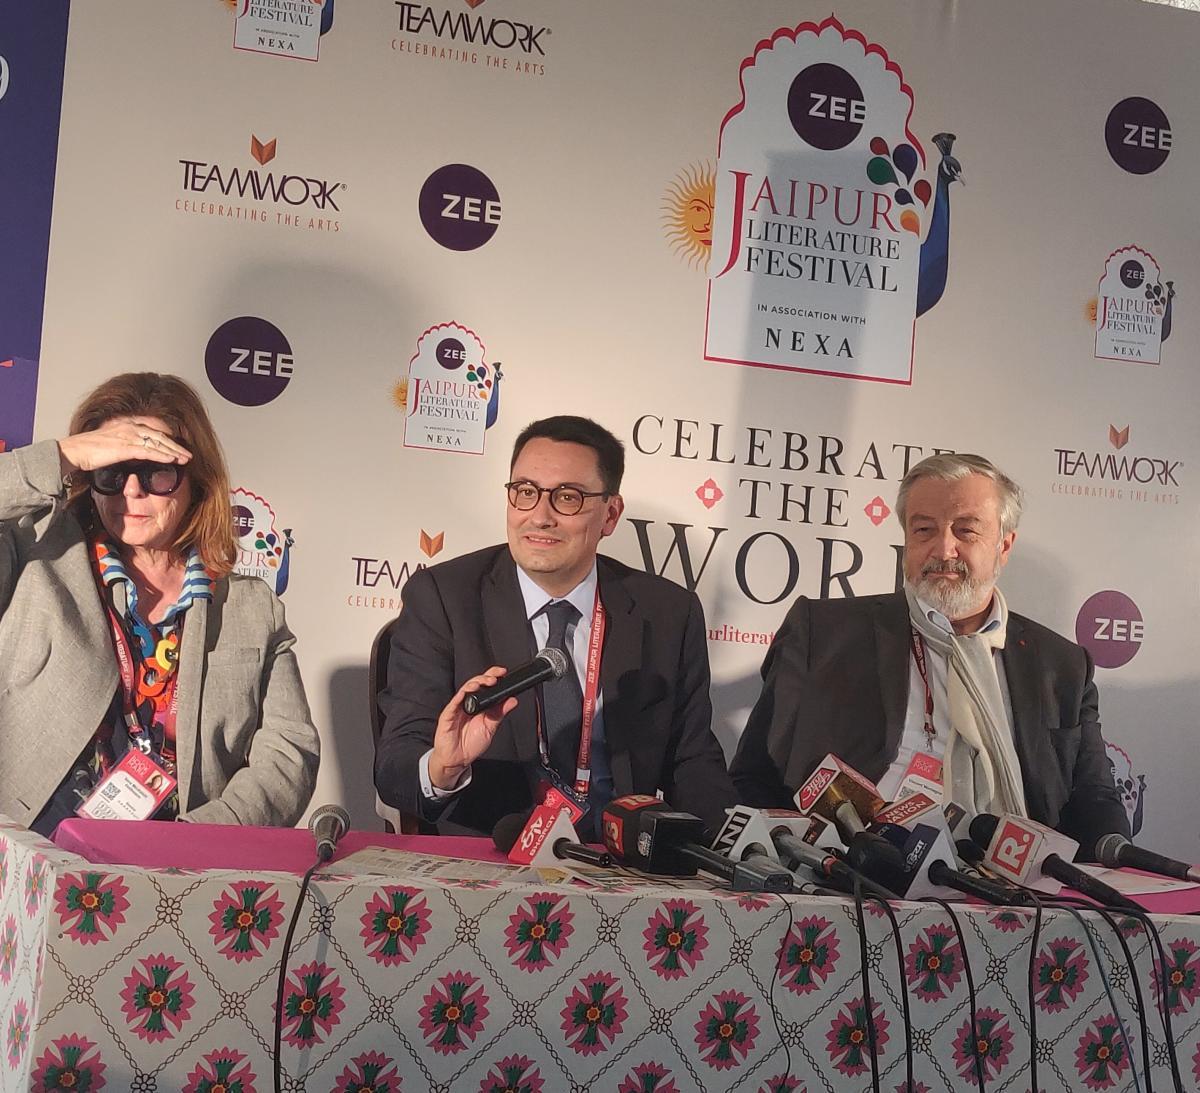 Ambassador of France to India, Alexandre Ziegler (centre), speaks at the JLF on Friday. Photo by SUMAN SARKAR